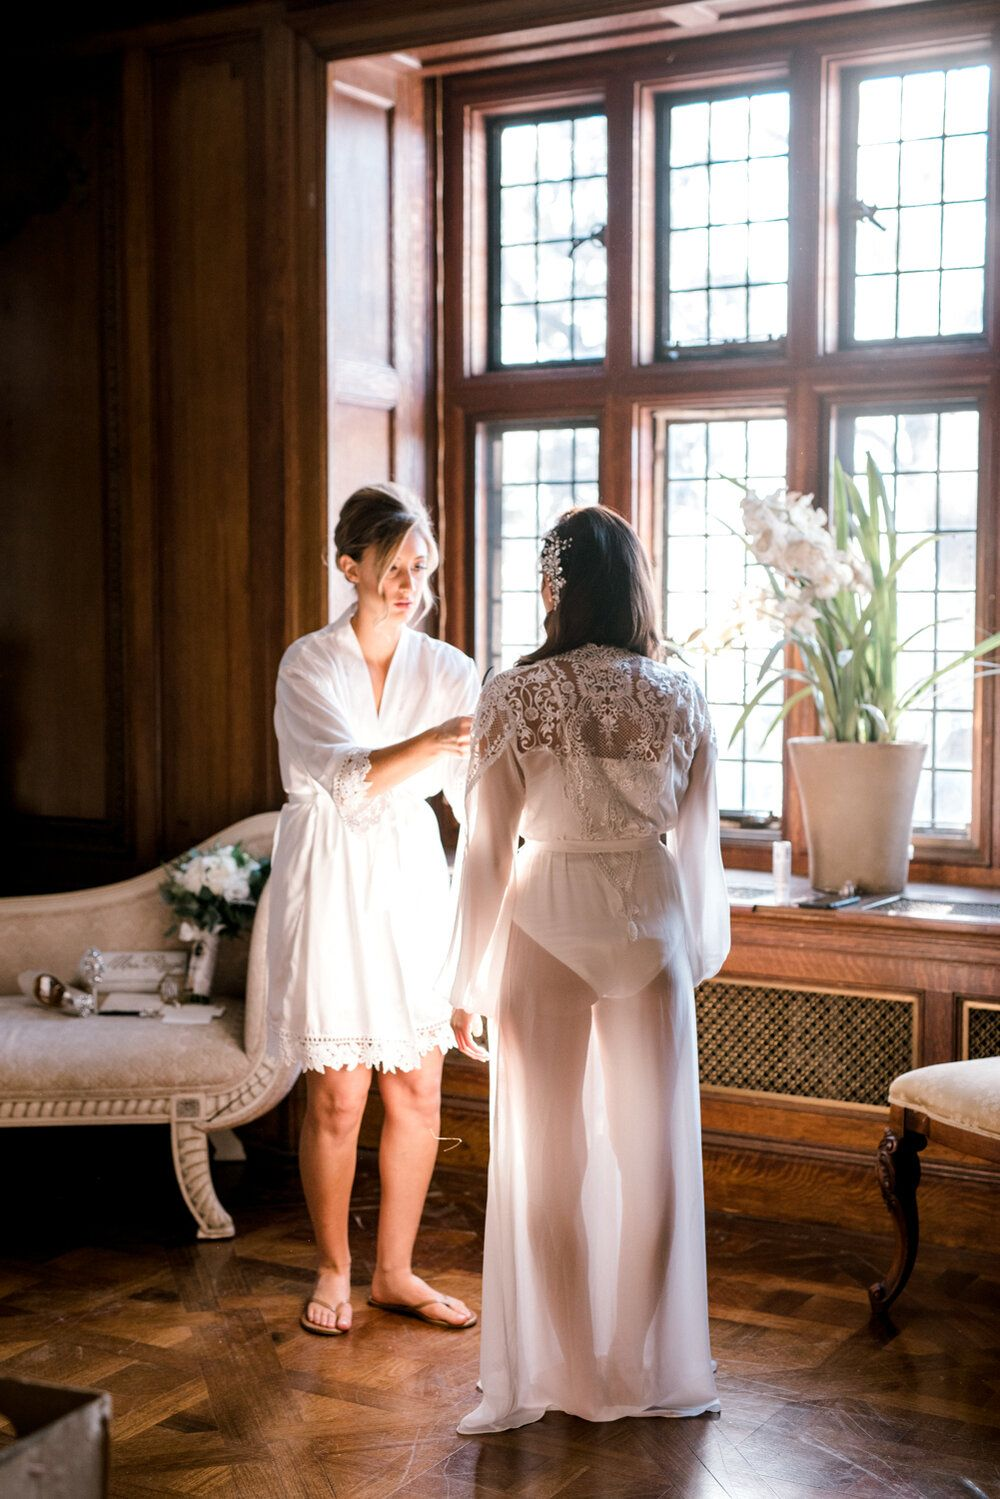 Skylands Manor Christmas 2020 Skylands Manor Wedding | Getting Ready | Long Lace Bridal Robe in